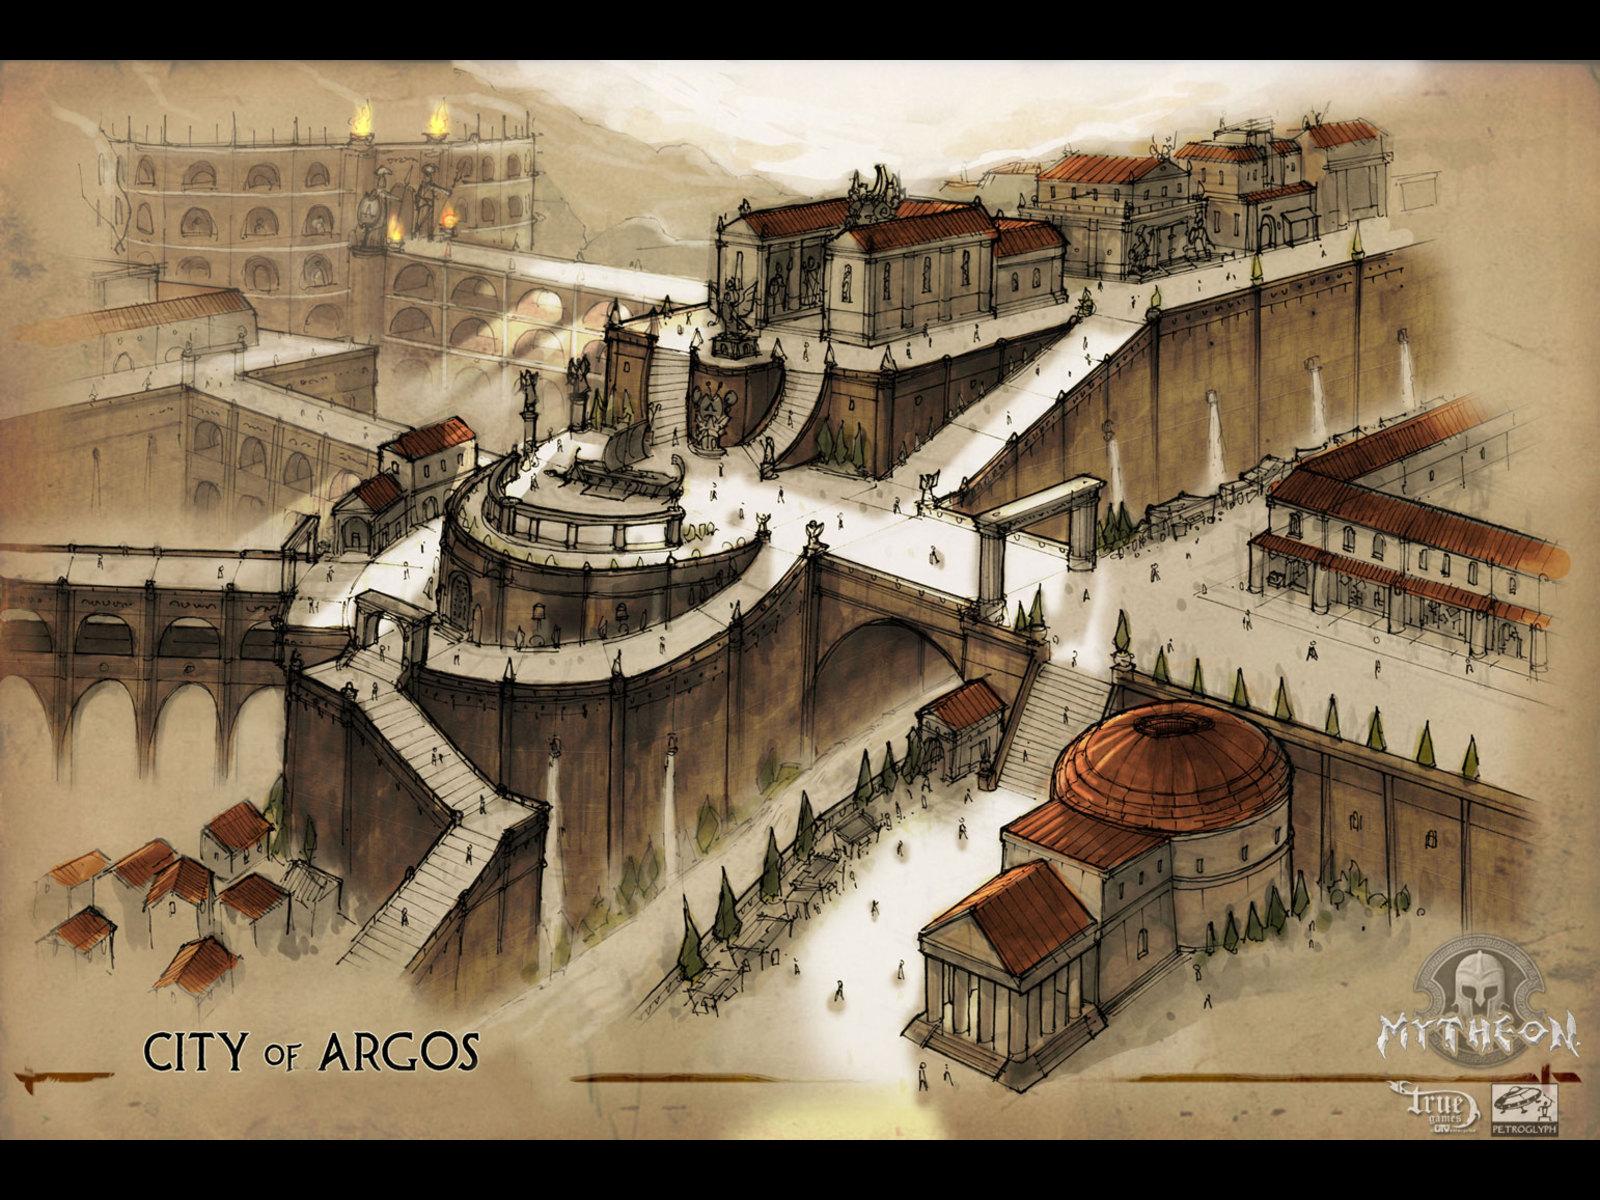 48 Argos Wallpaper On Wallpapersafari